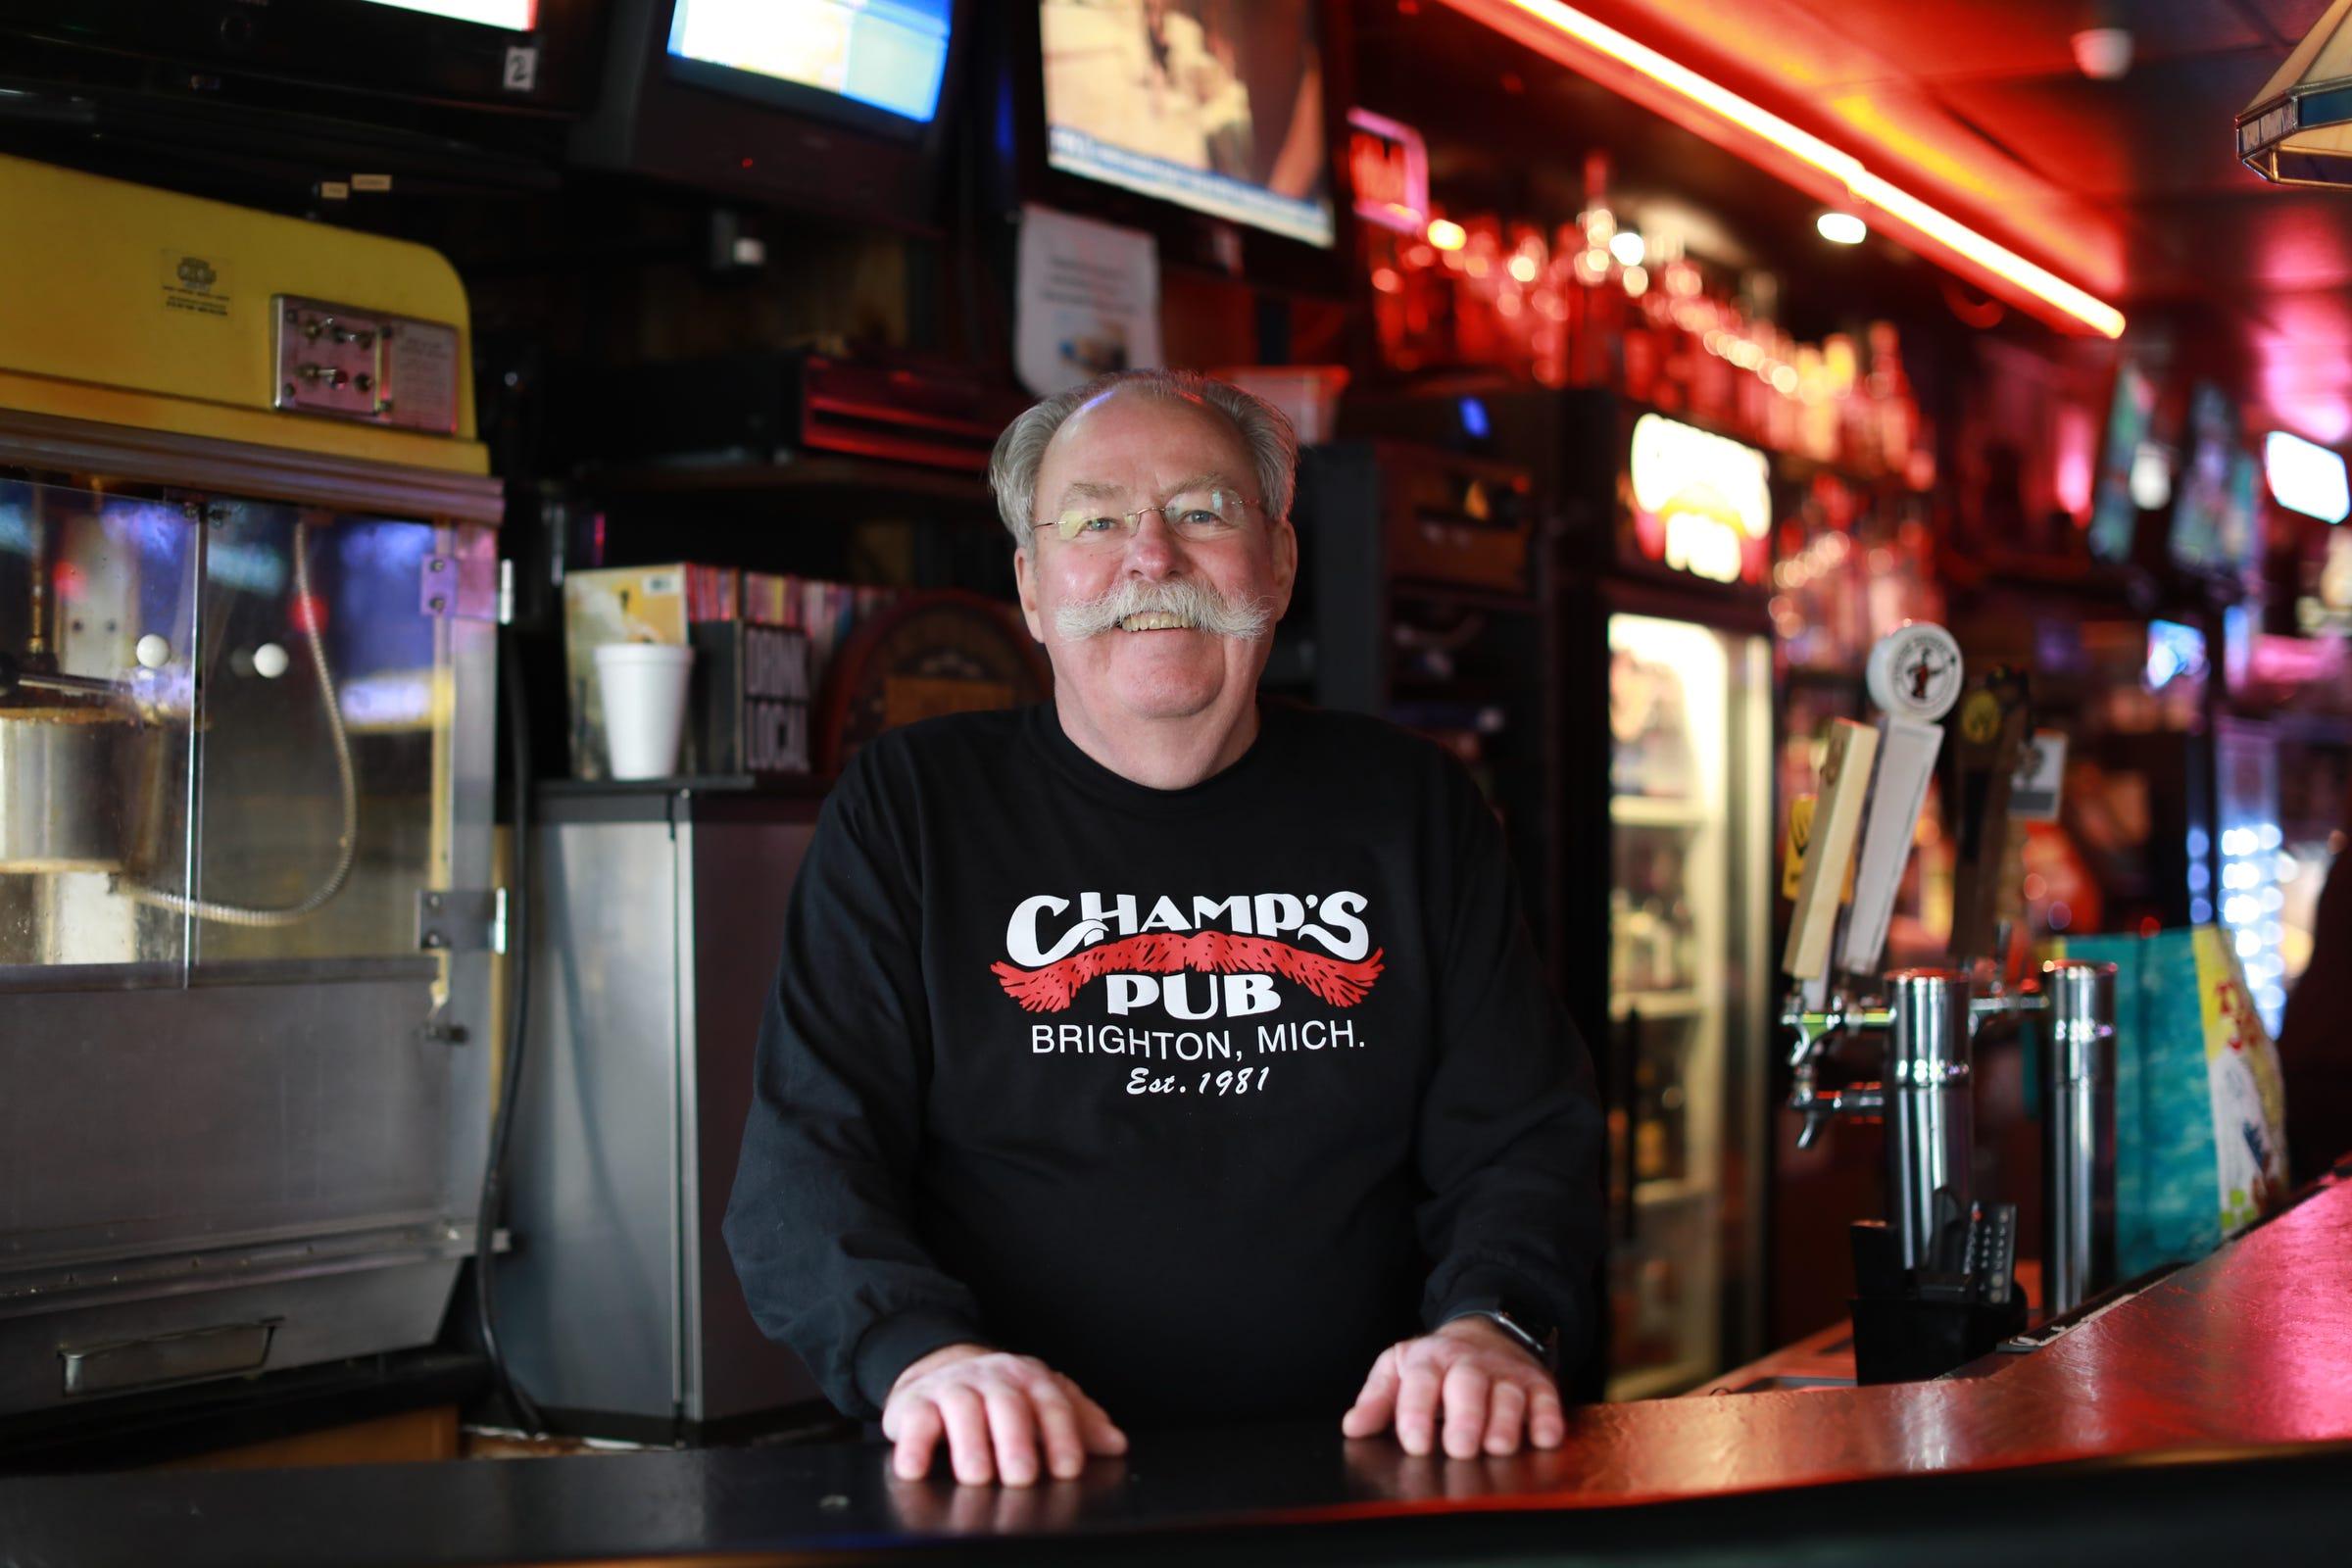 Kid Rock donates $100K to help hard-hit bars, restaurants, gyms